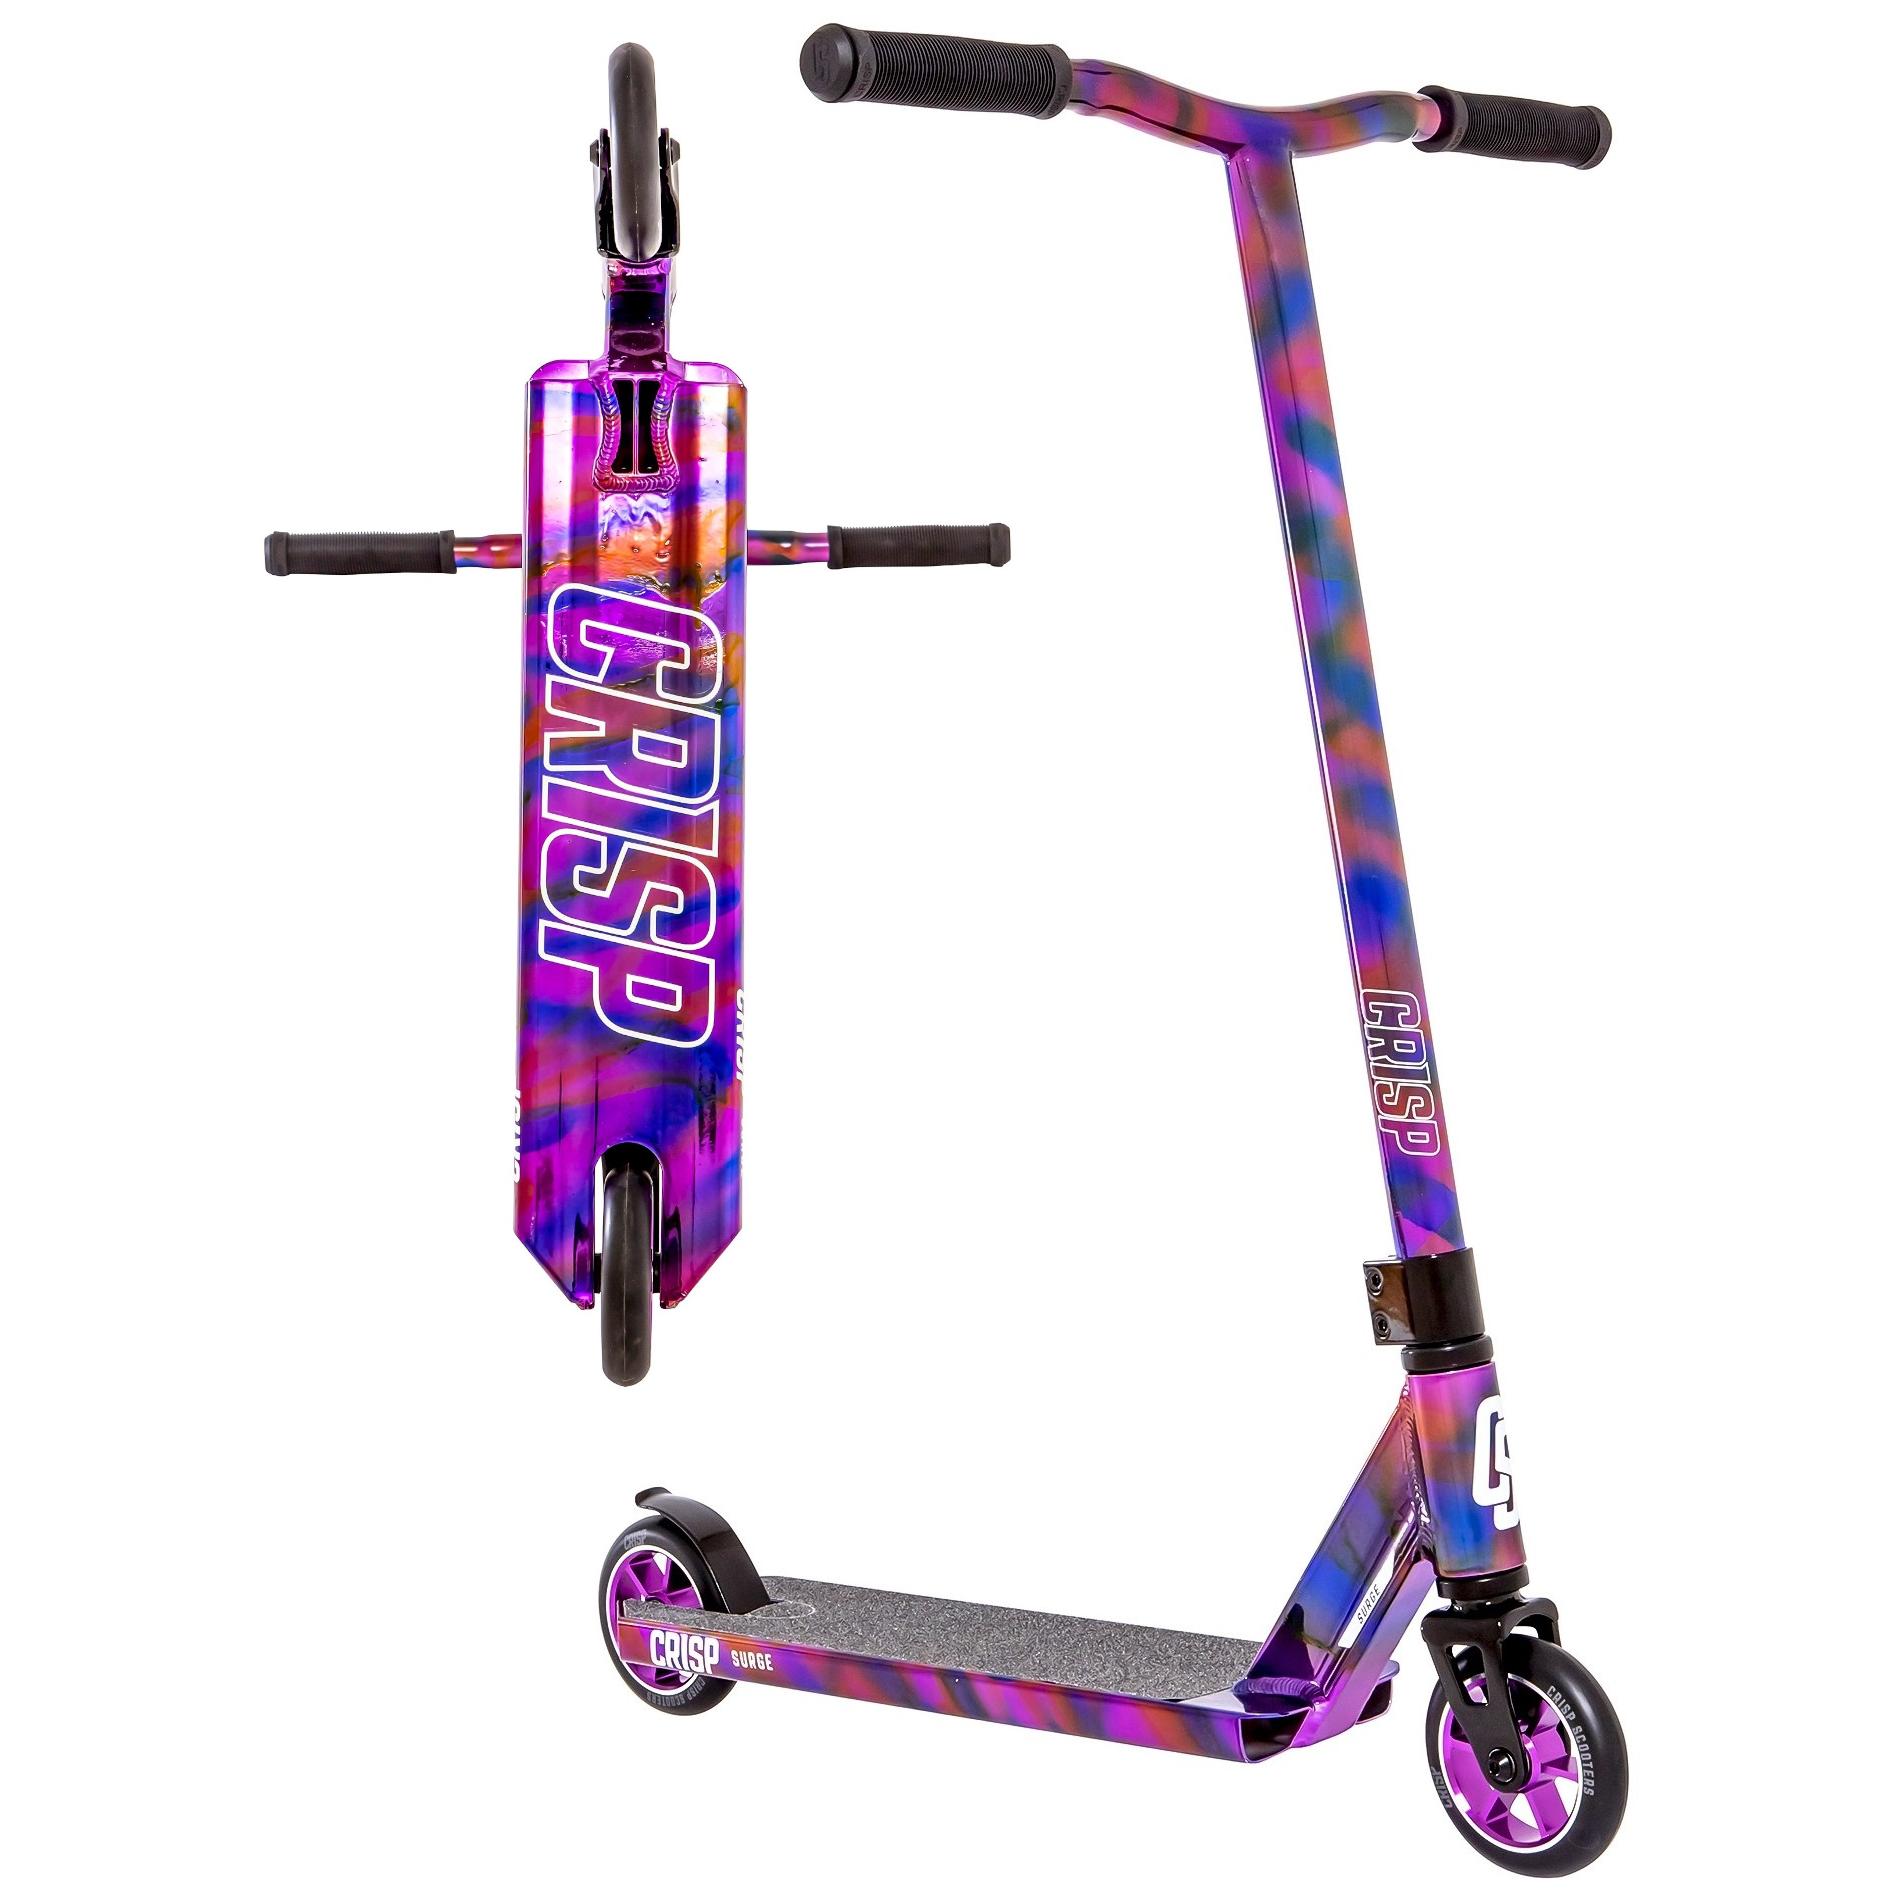 Crisp Surge 2020 Complete IHC Compression Childrens 820mm Stunt Scooter